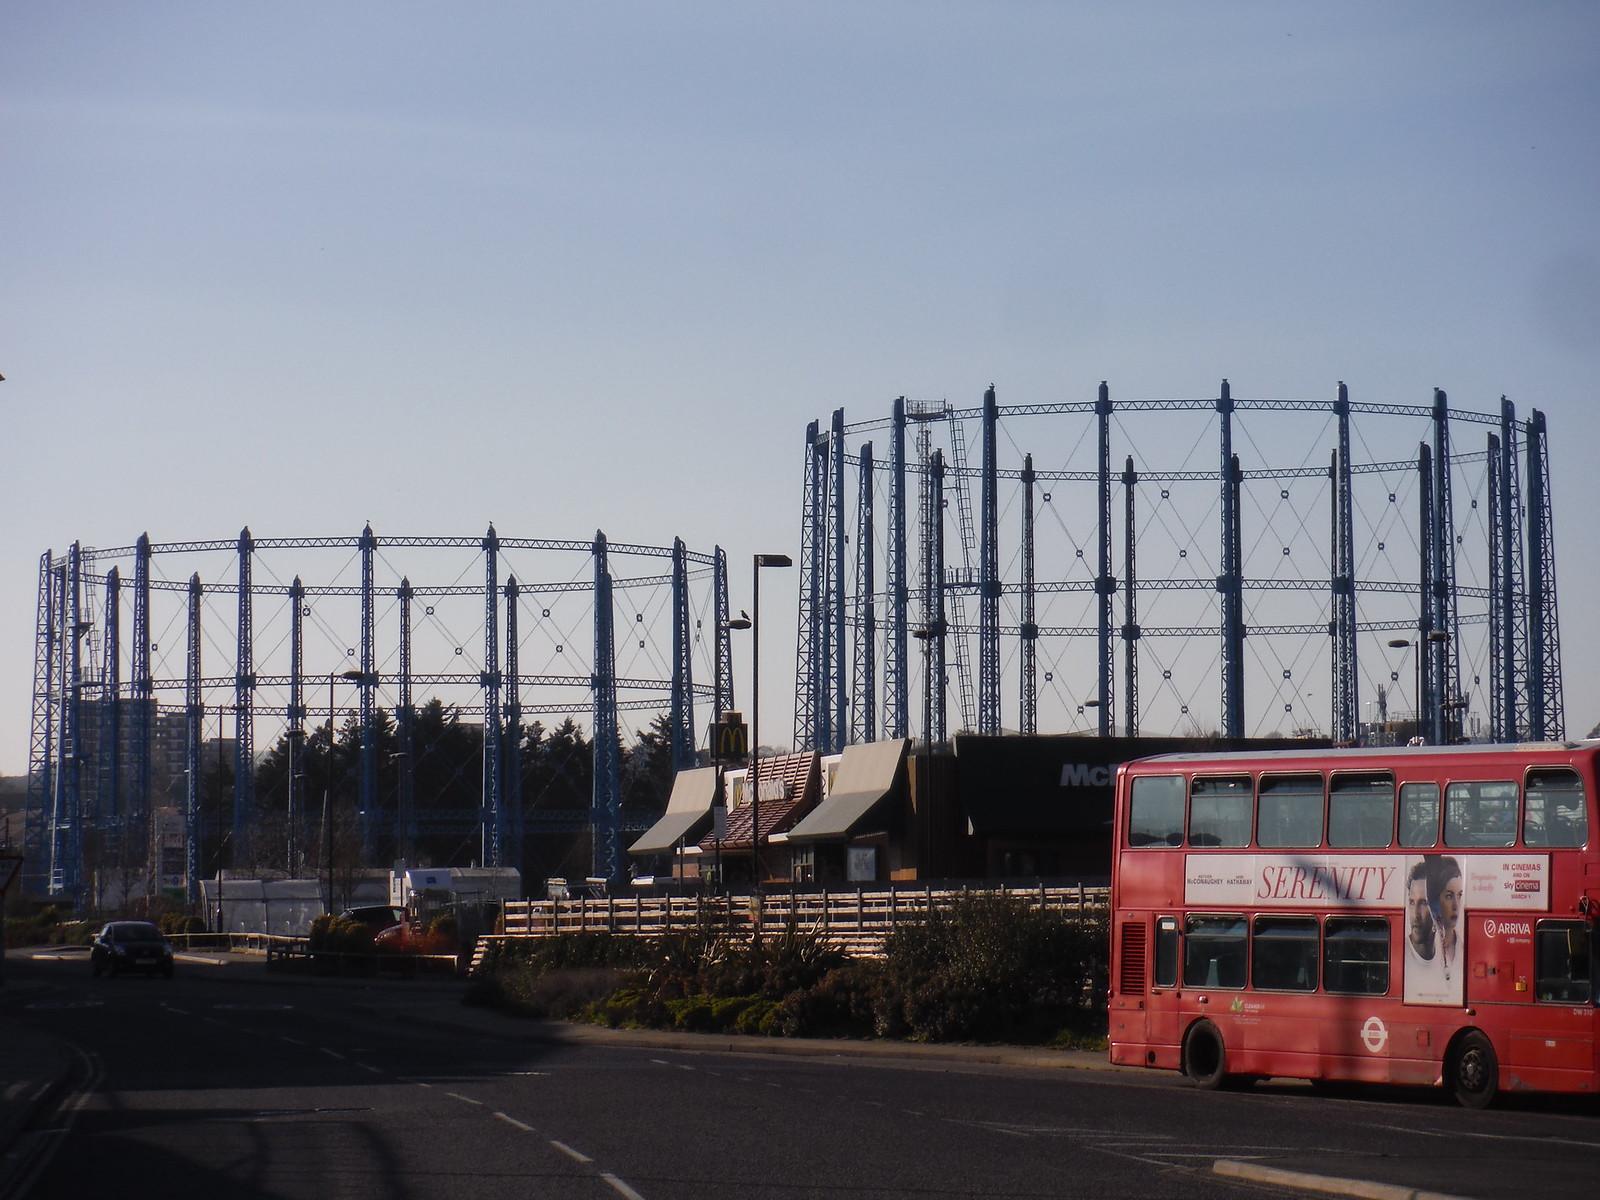 Ex-Gasworks Site at Bell Green SWC Short Walk 36 - Waterlink Way (Lower Sydenham to Greenwich)